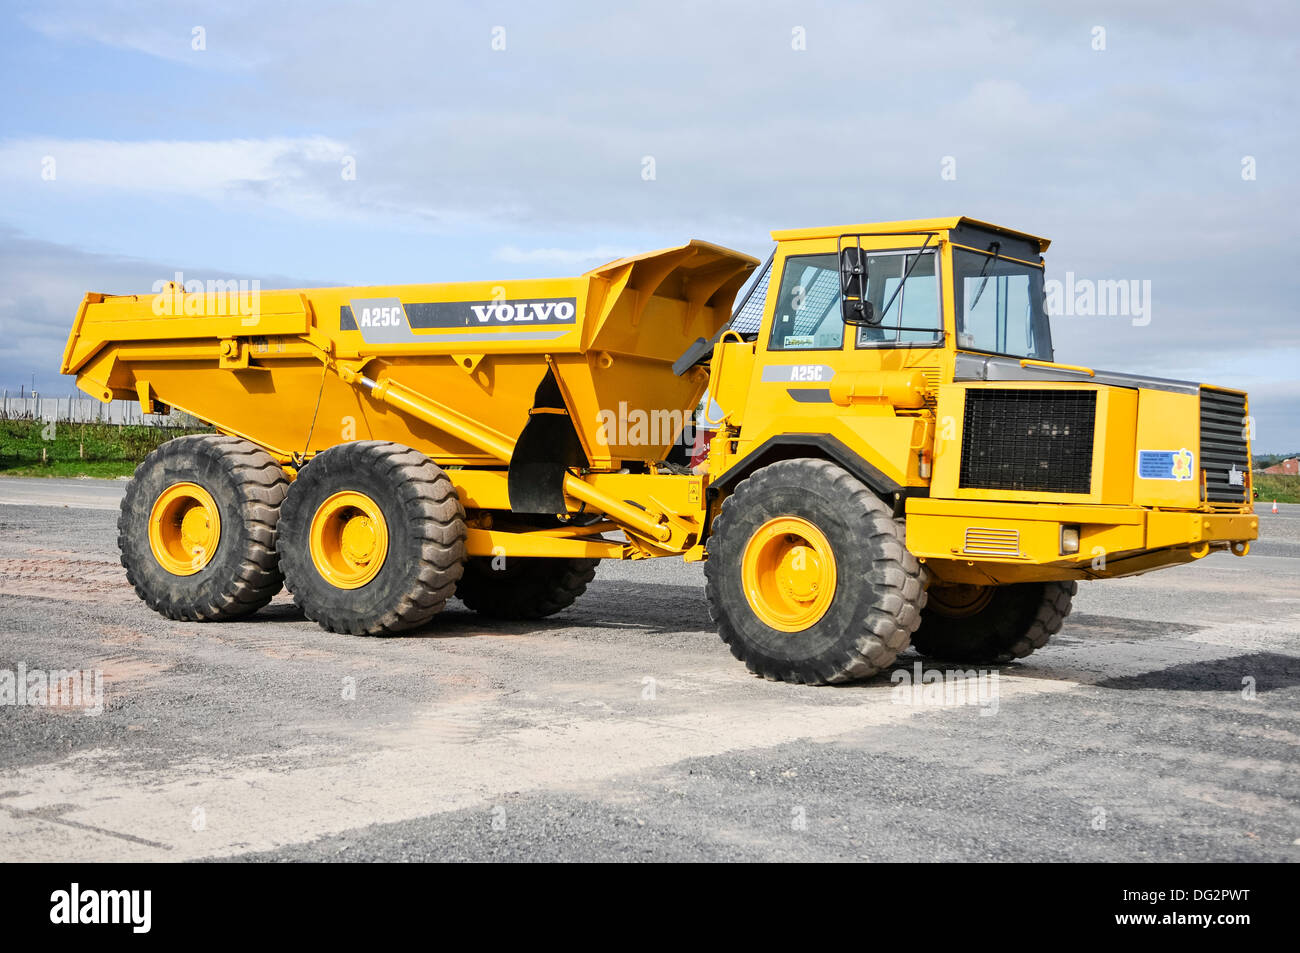 A Volvo A25C dumpster dump truck Stock Photo: 61527476 - Alamy